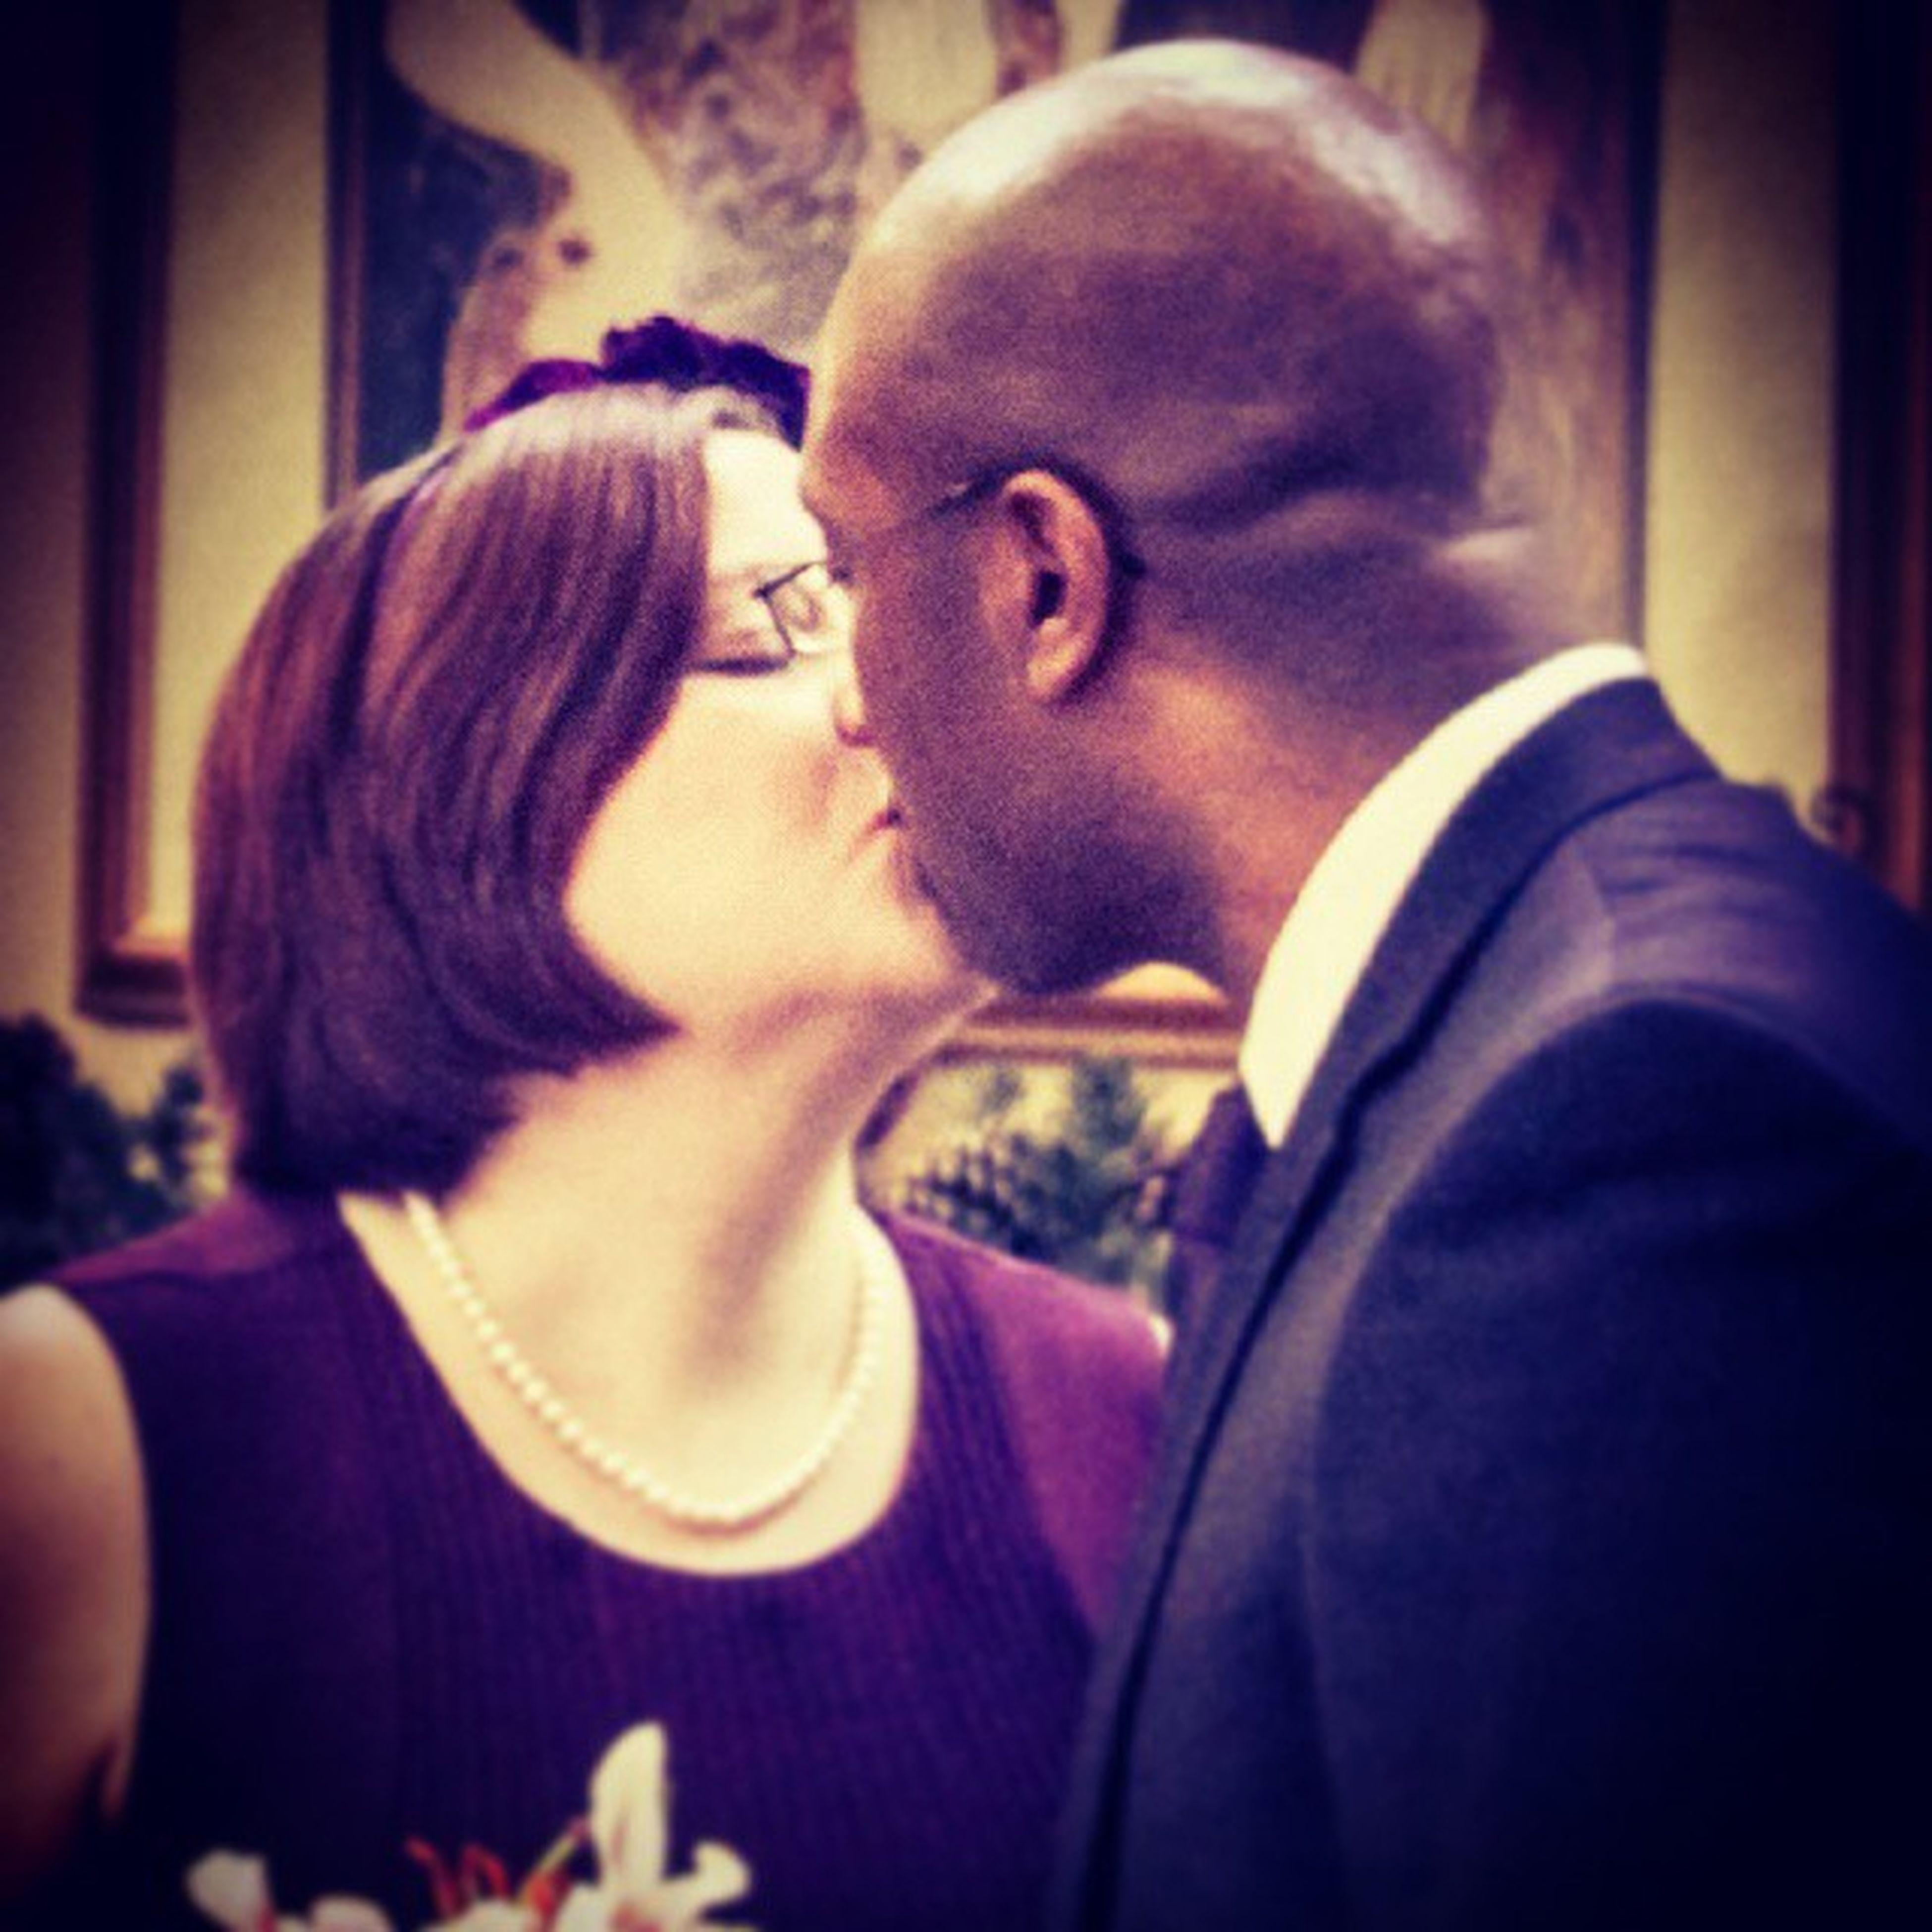 Celebrating another year of wedded bliss to my handsome husband! Happy Anniversary TeamPinnock TBT  Anniversaries Weddings firstkiss unforgettableinstagram